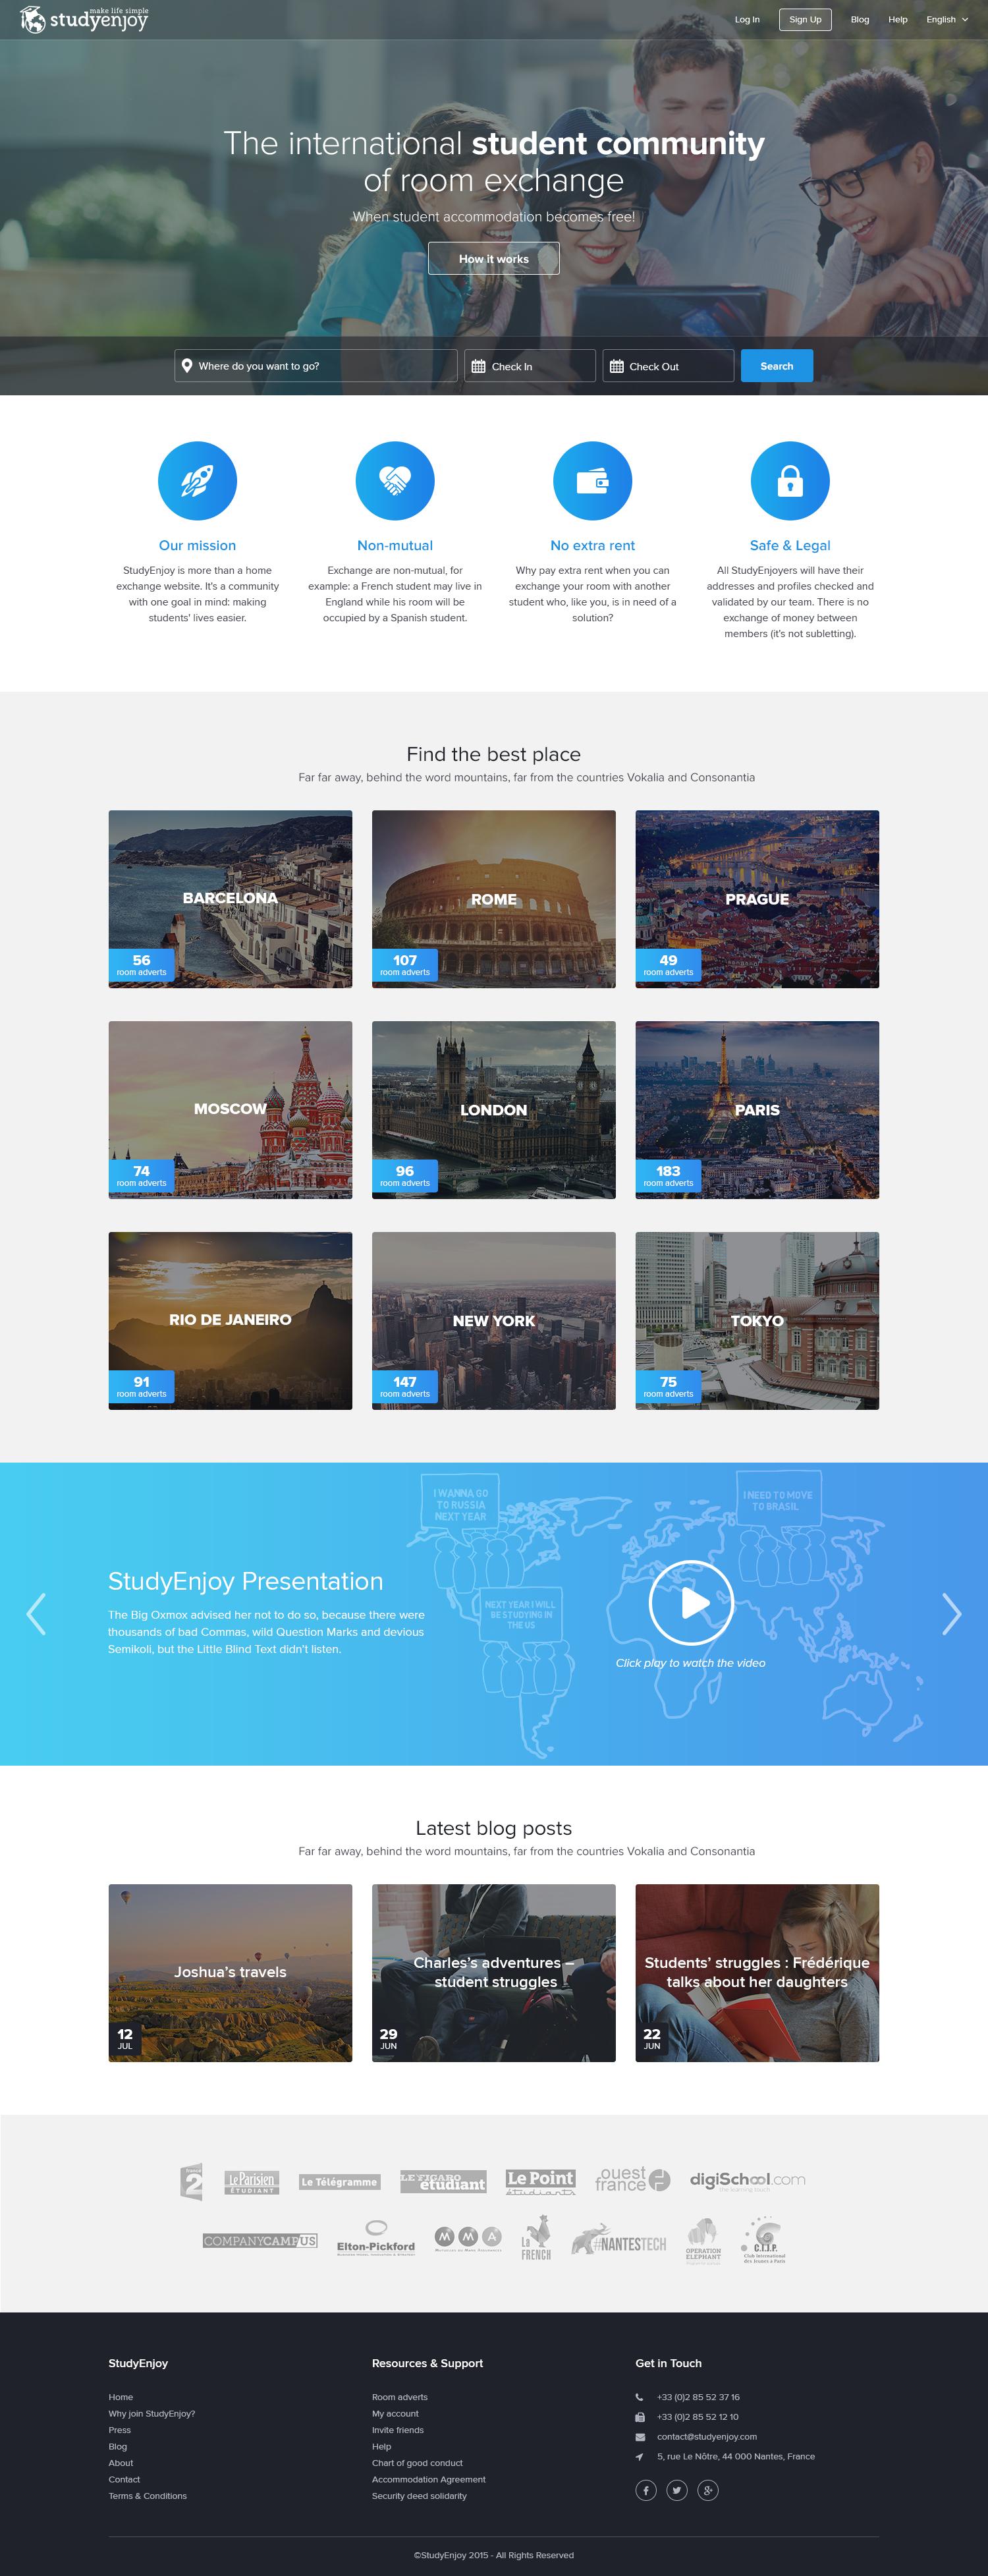 Studyenjoy homepage